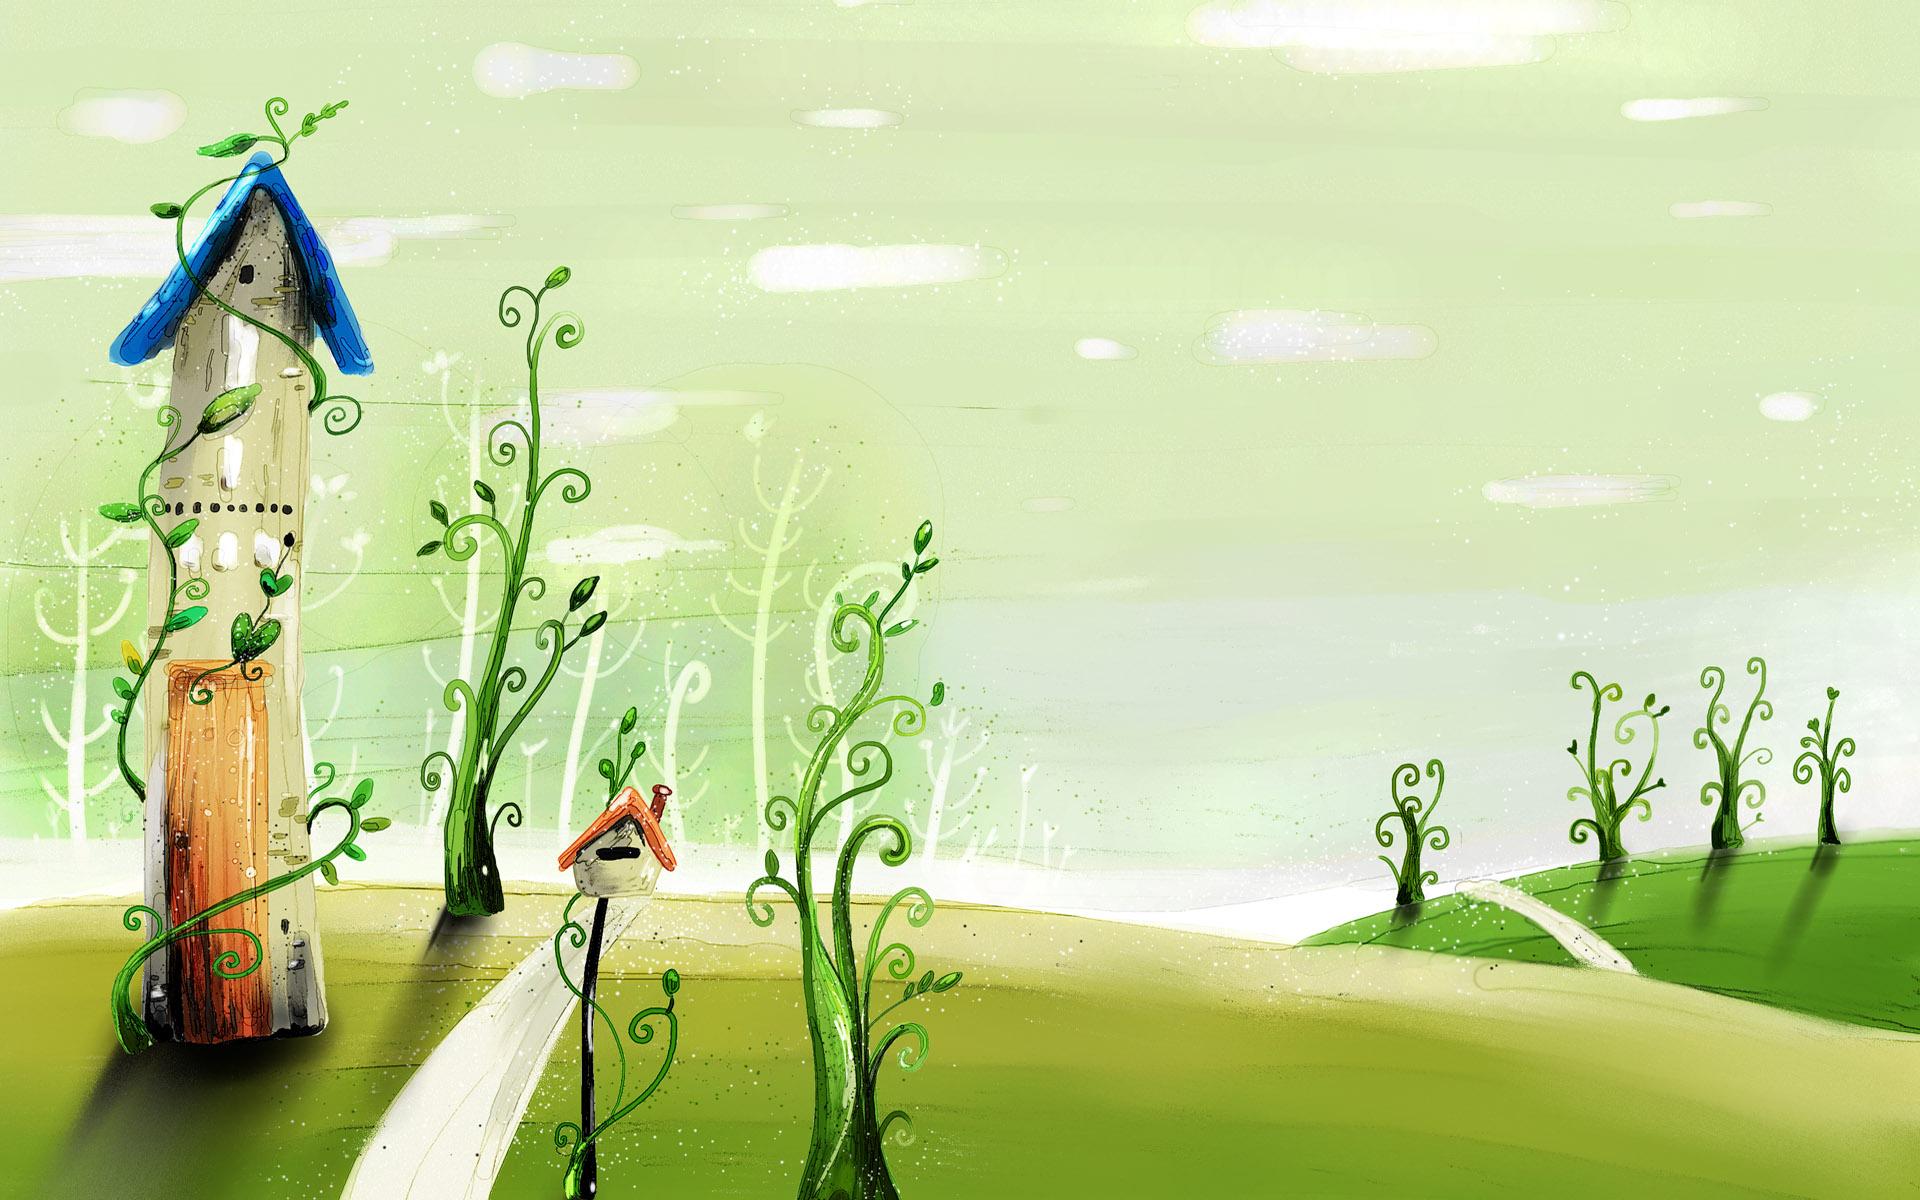 spring cartoon wallpaper 1024x640 1920x1200